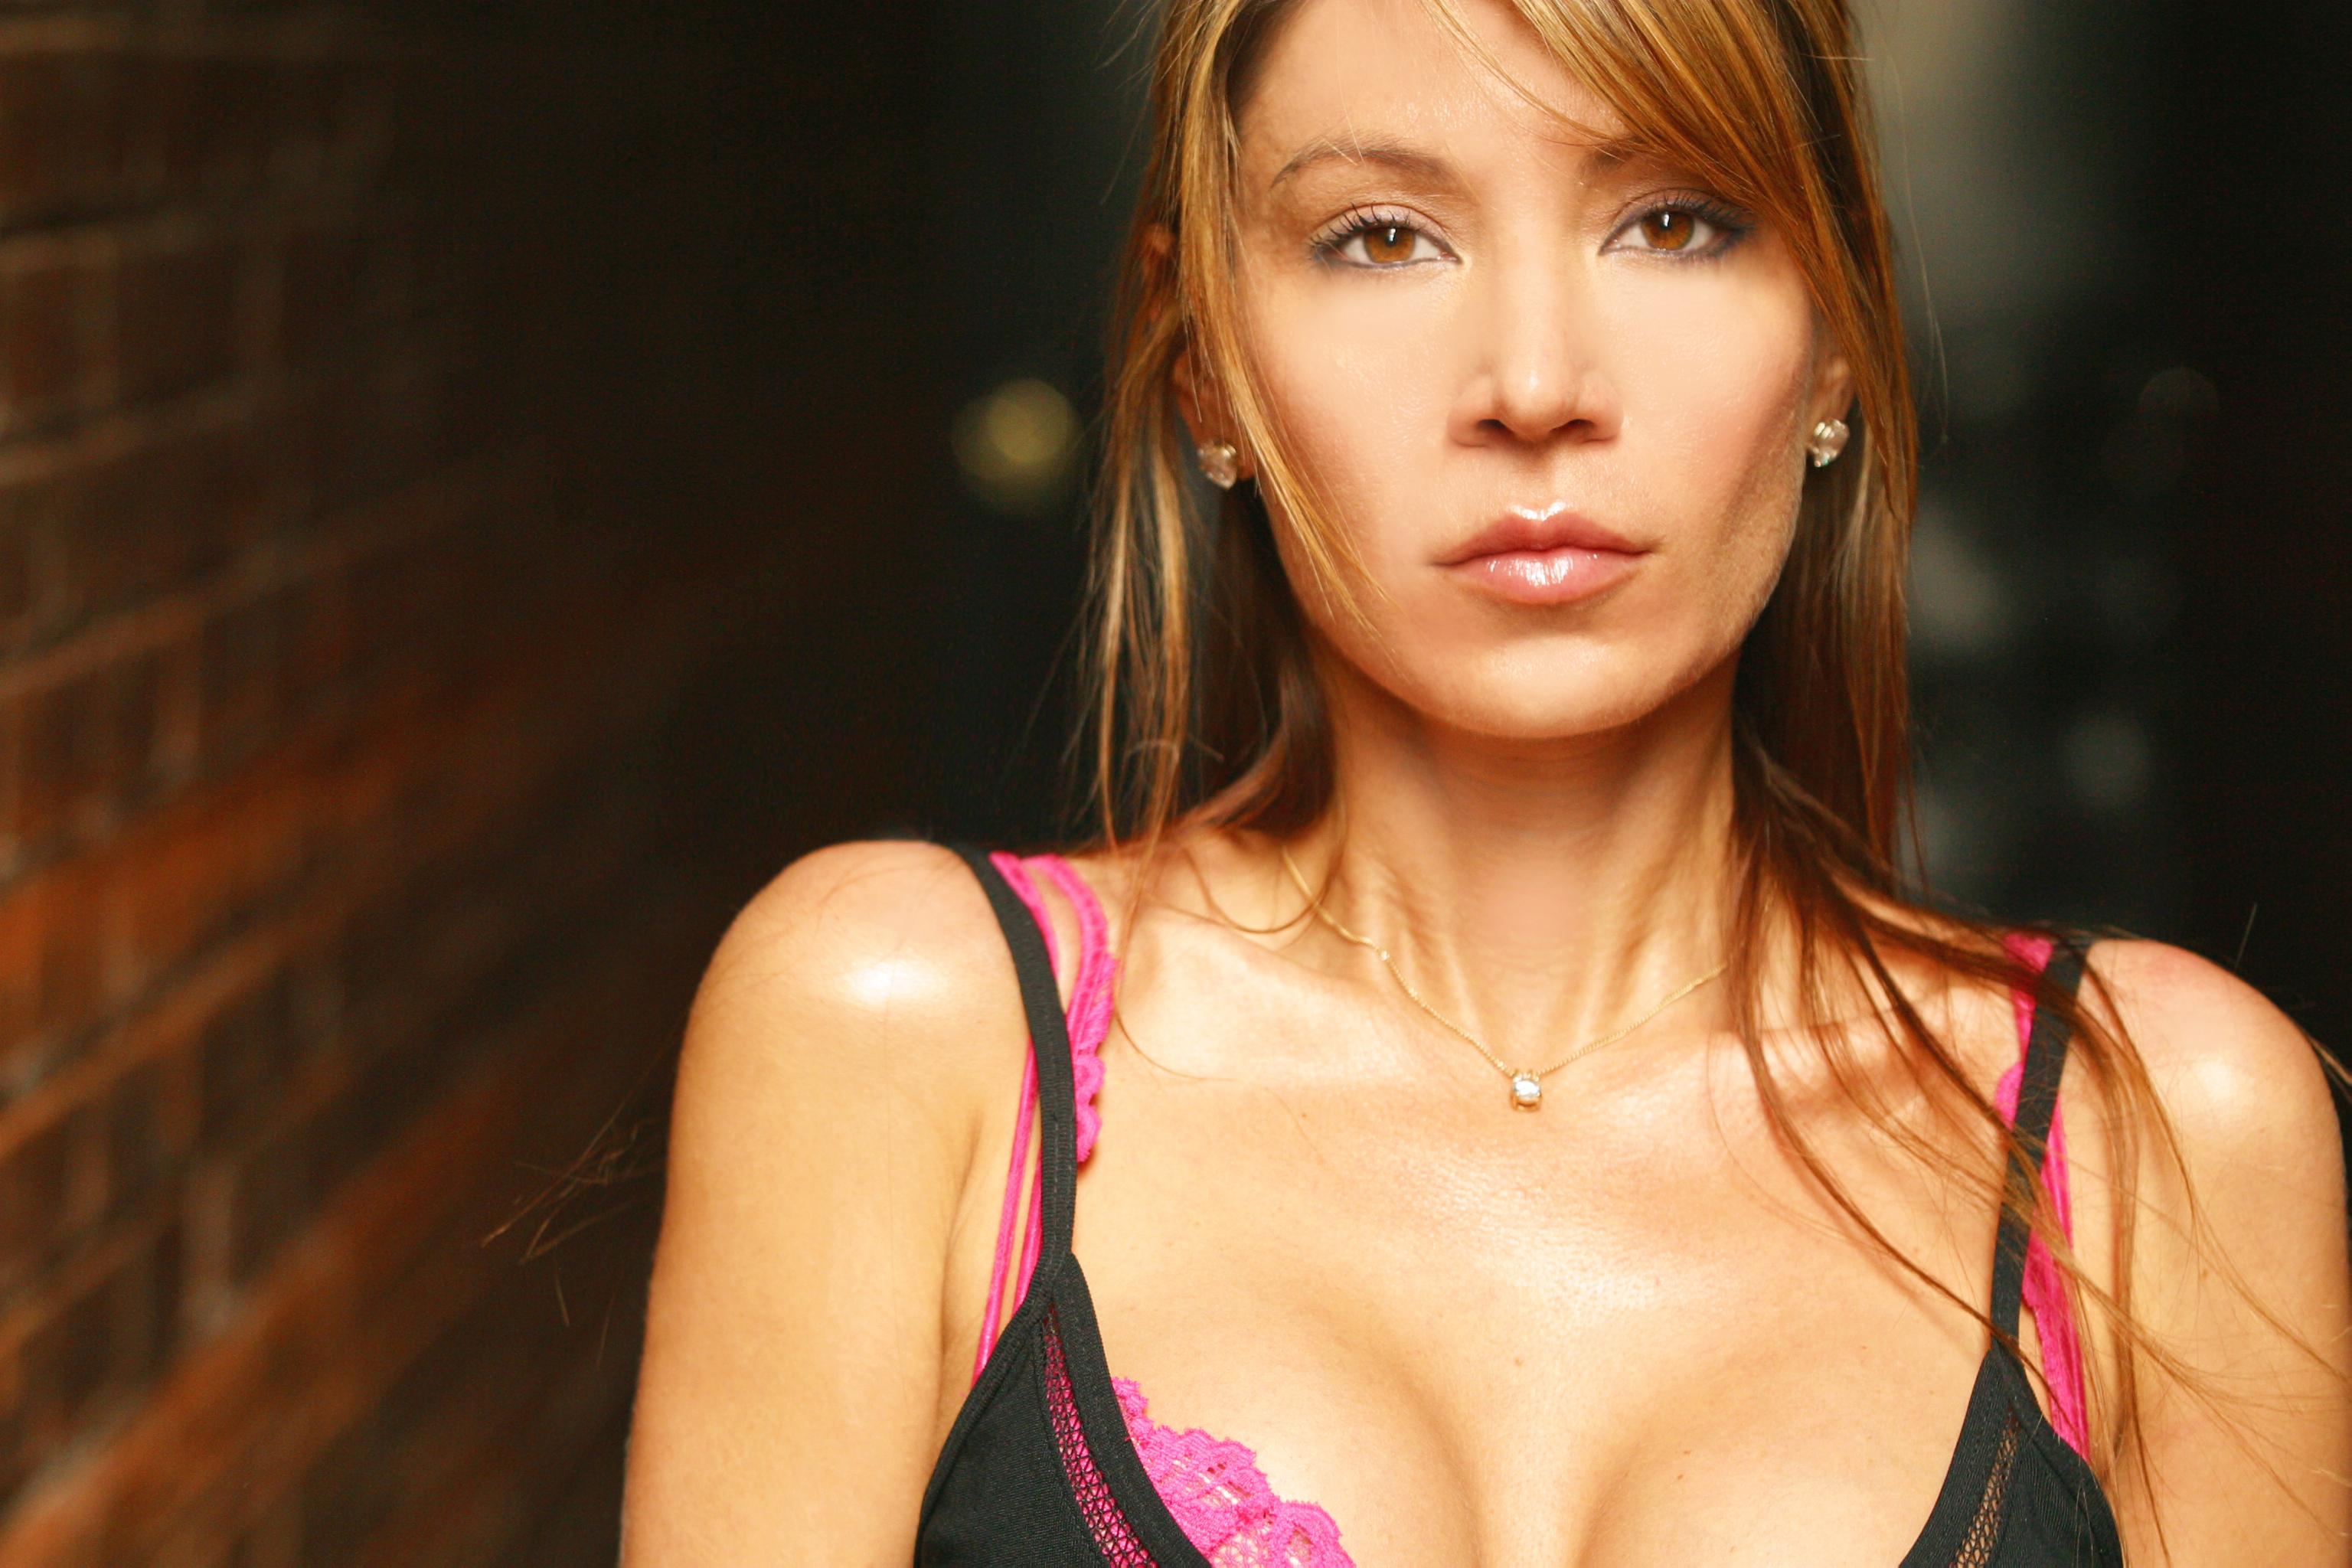 Cynthia Pinot naked (71 photo), Topless, Hot, Selfie, swimsuit 2020